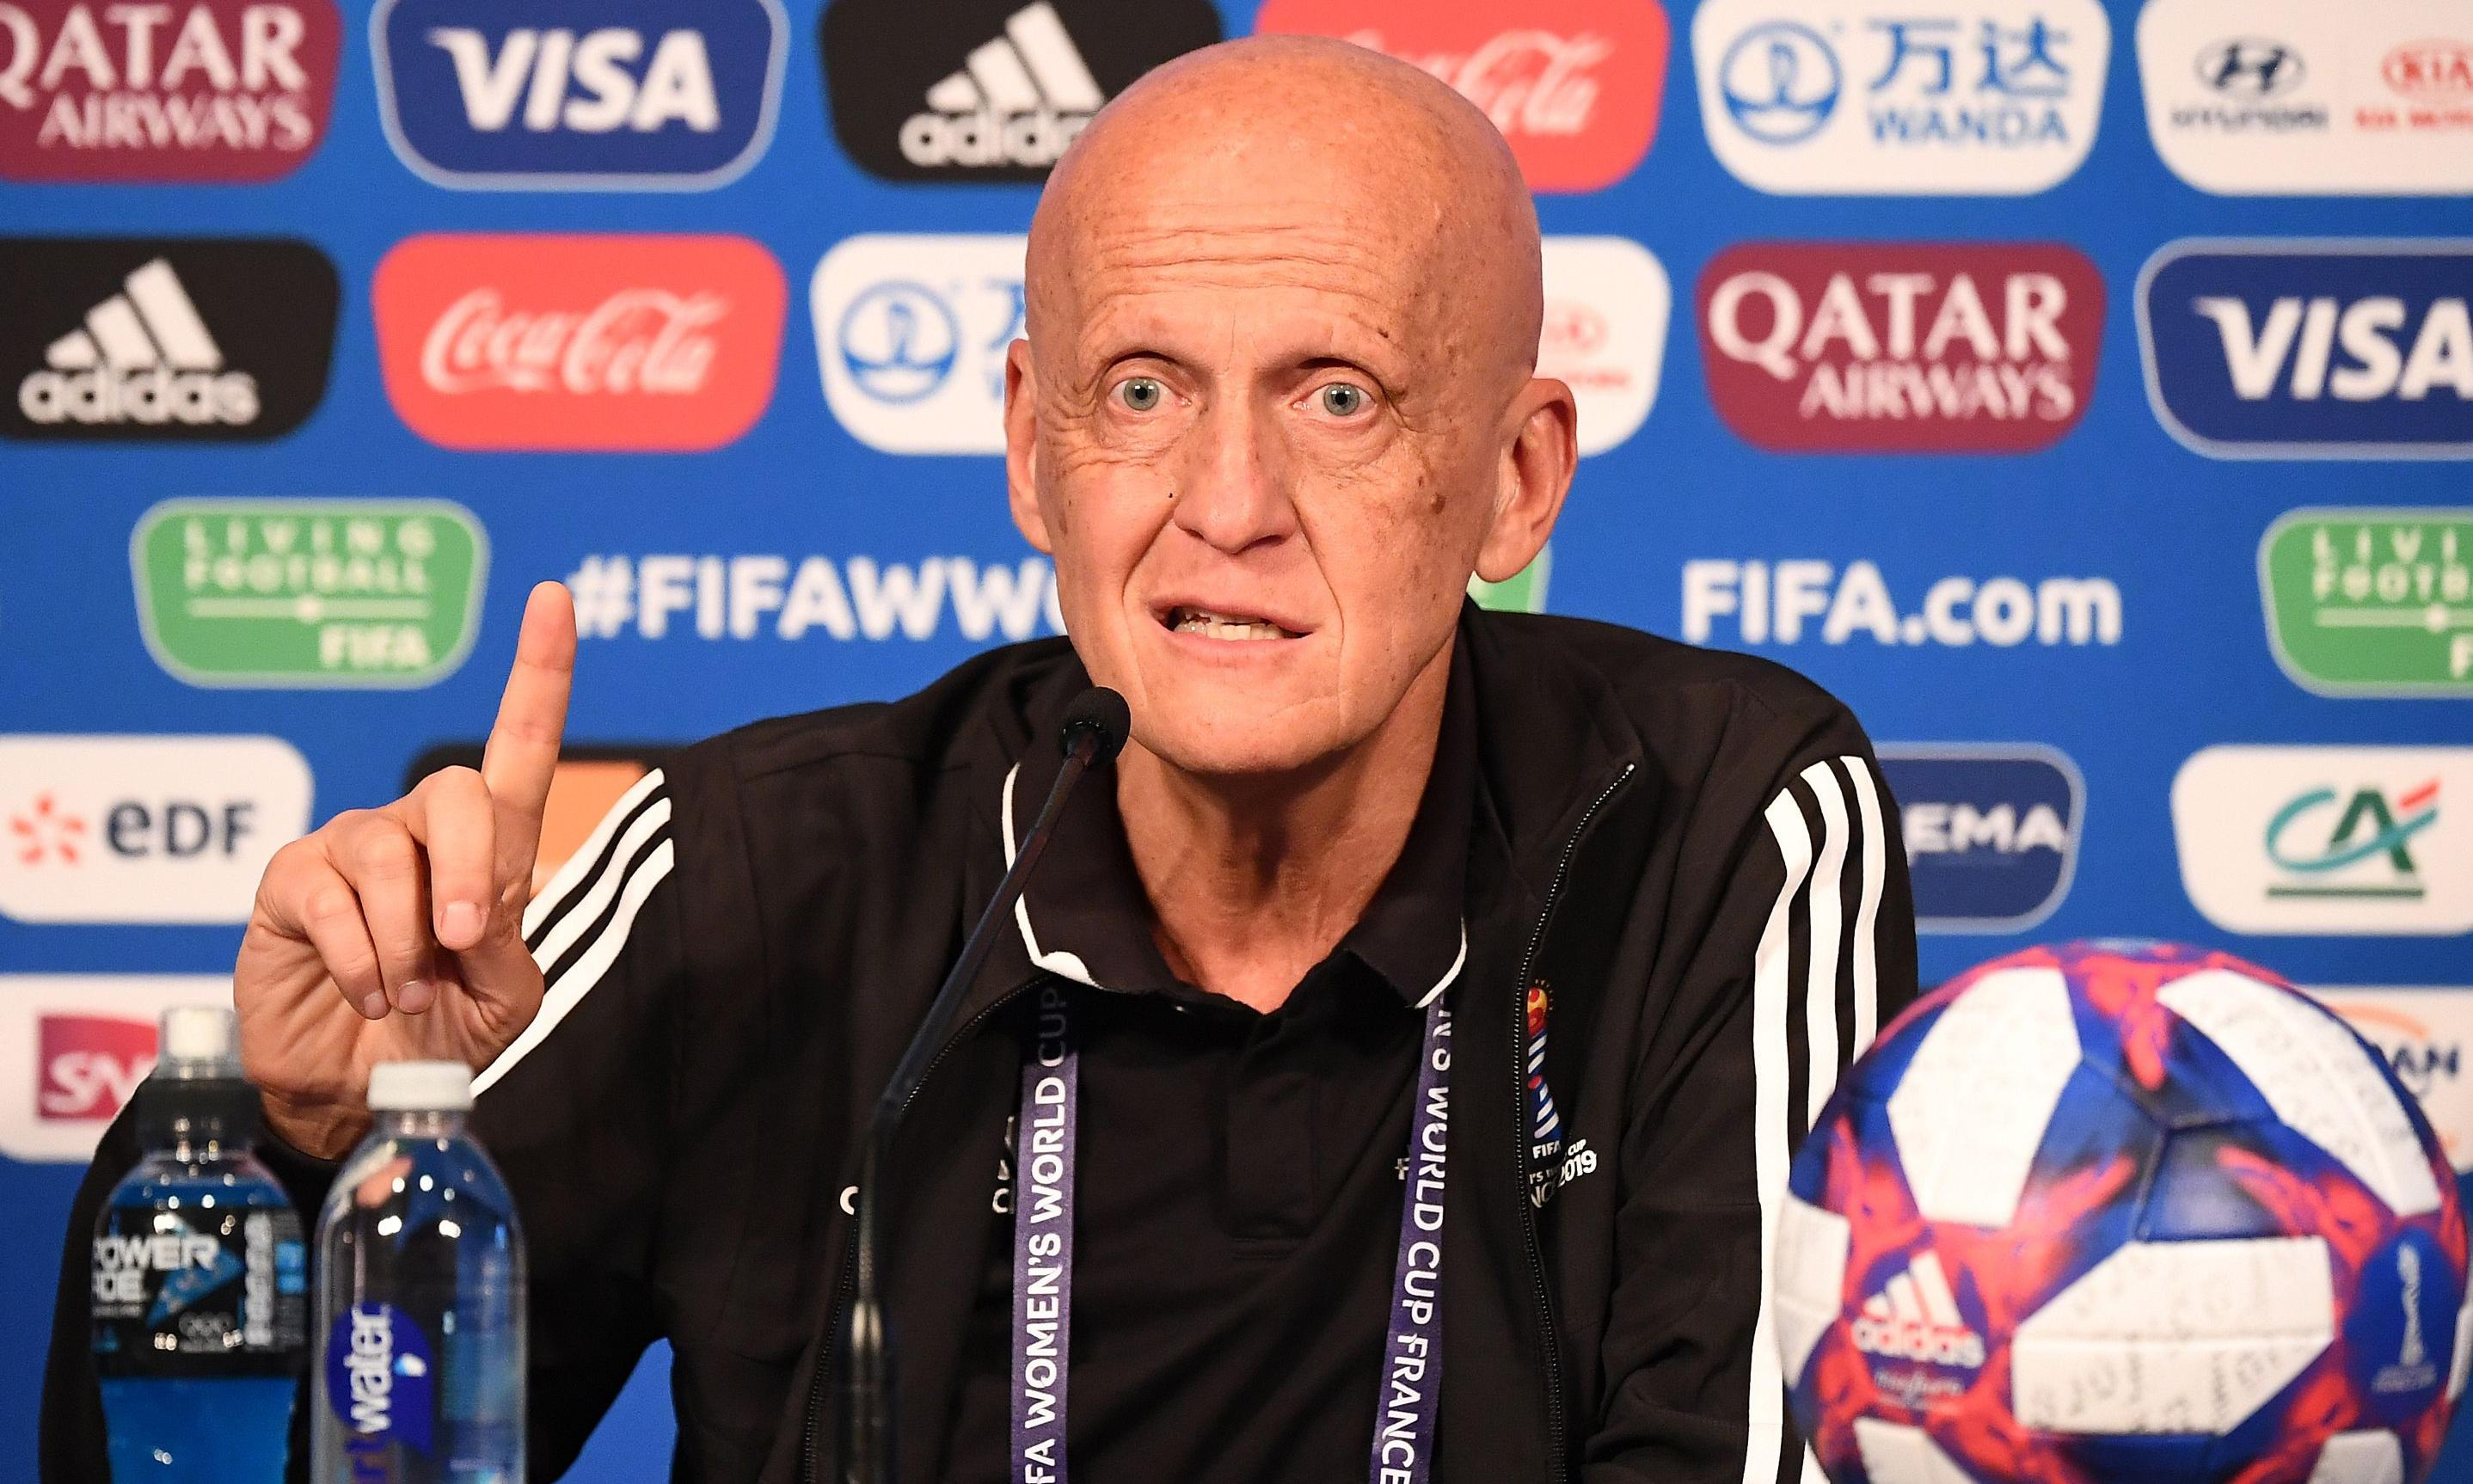 Bielsa-esque Pierluigi Collina defends referees and Fifa's new rules